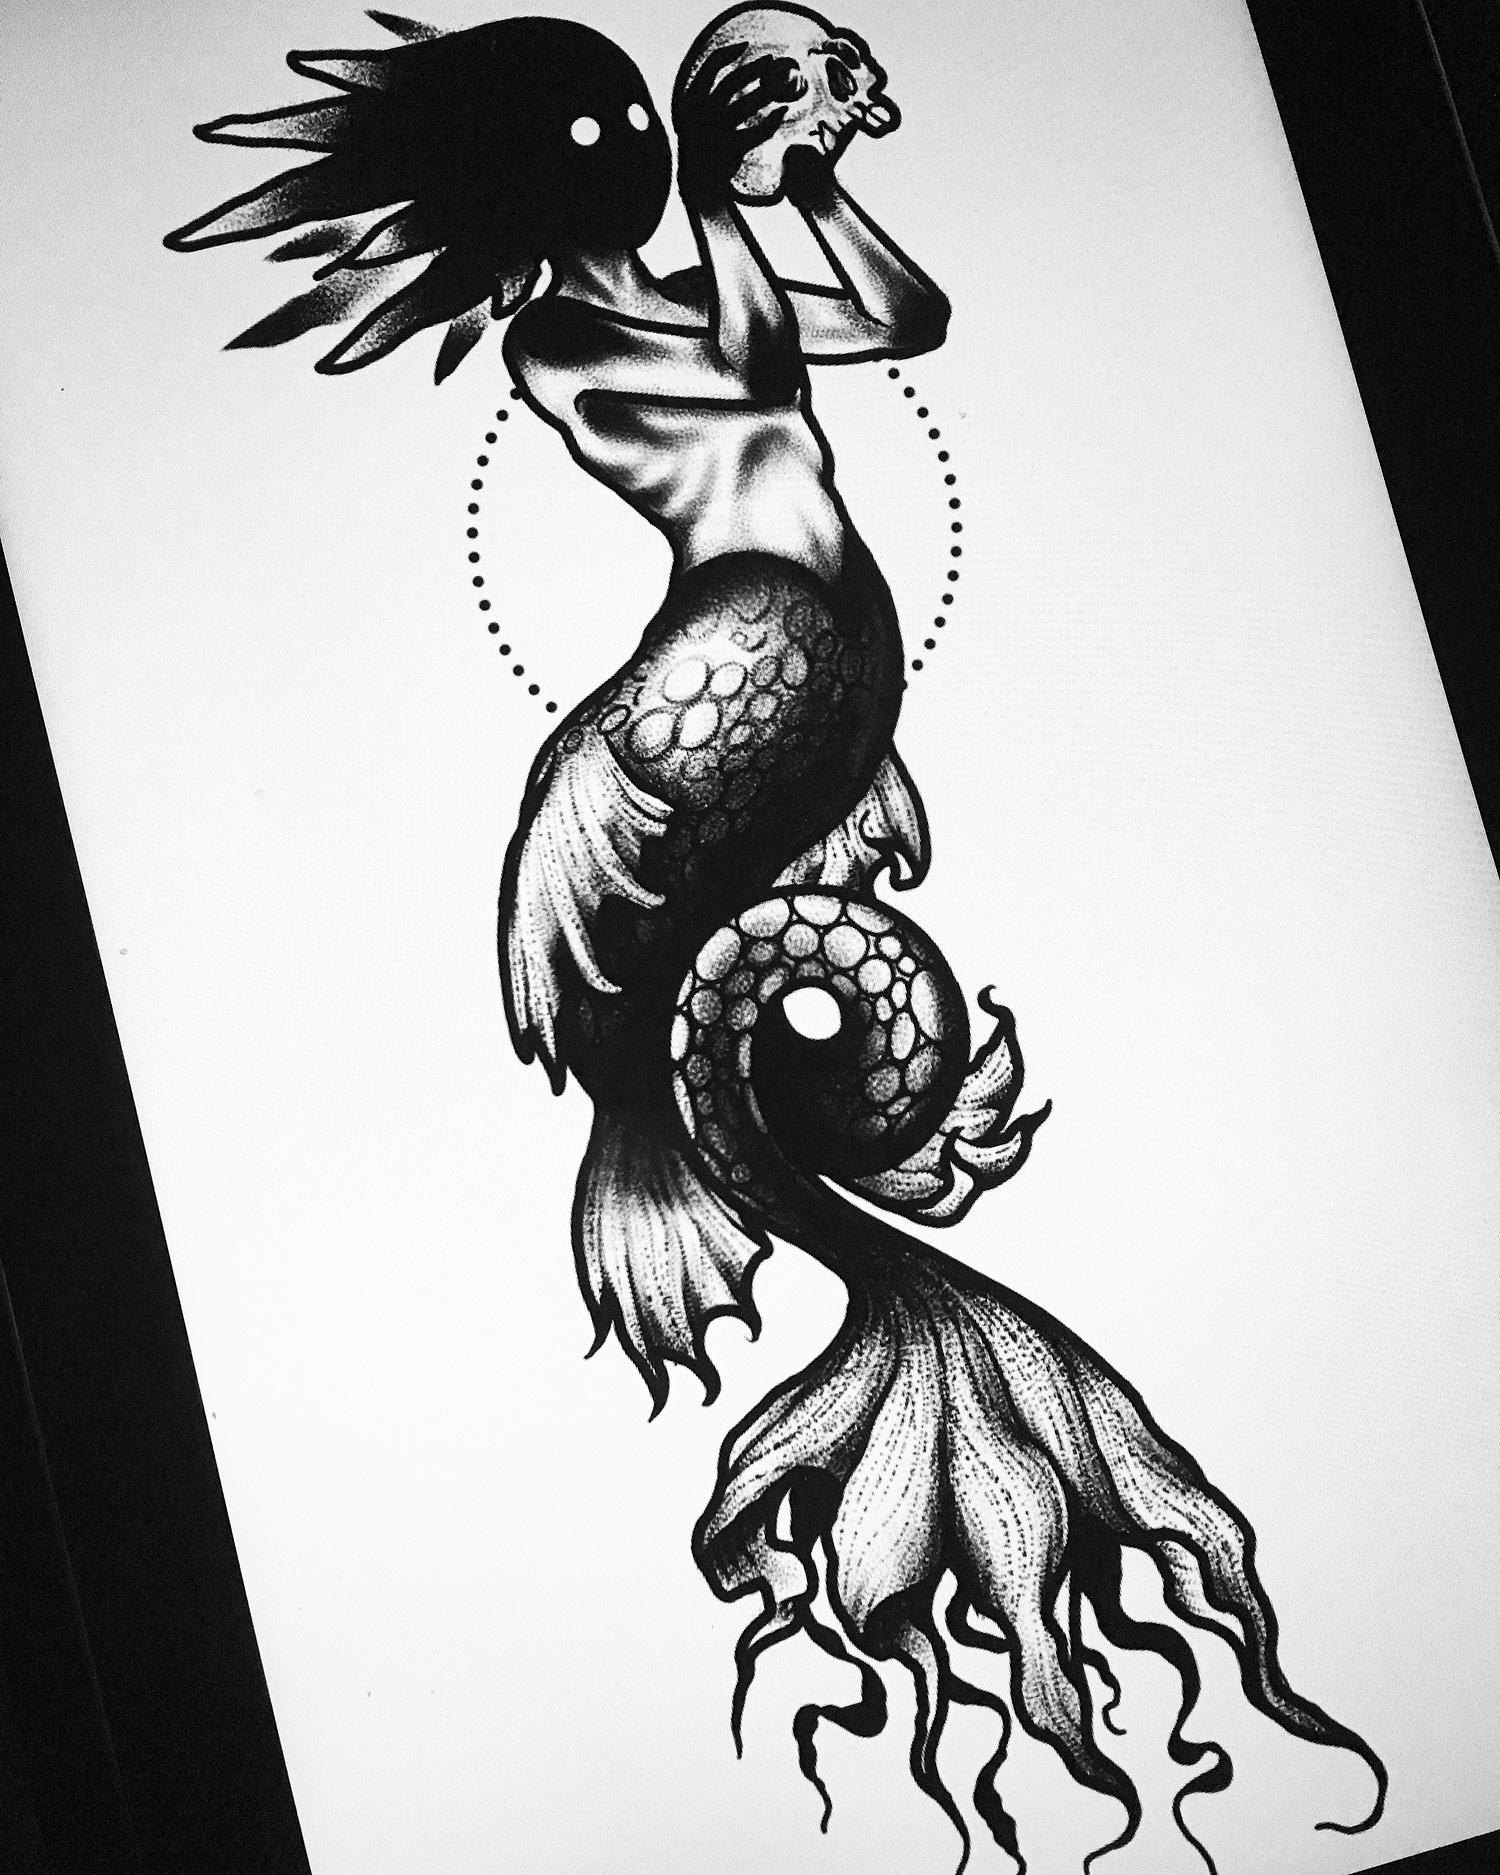 Agatha Schnips - mermaid darkhead